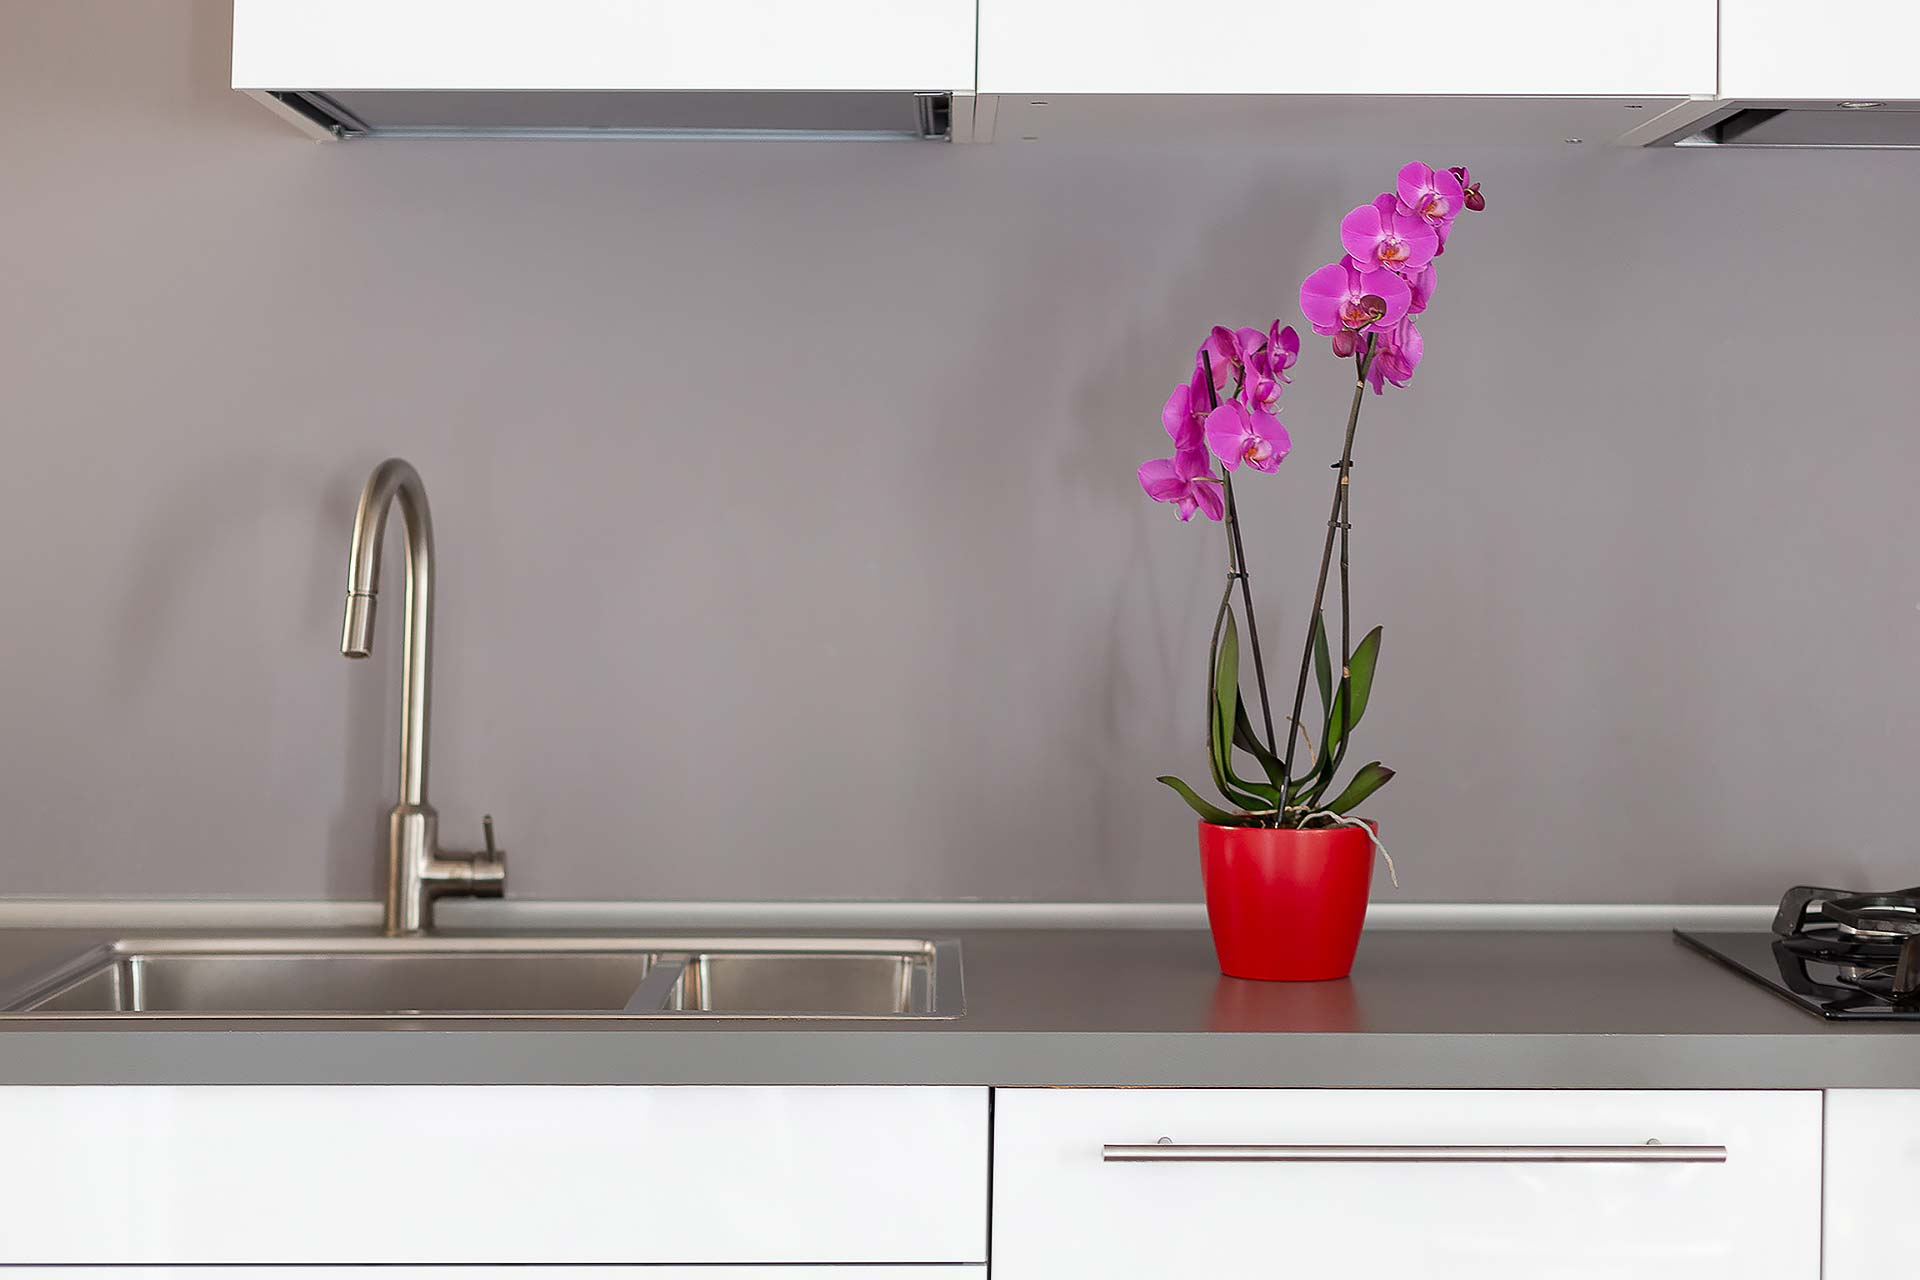 fotografo-airbnb-booking-case-particolare-cucina